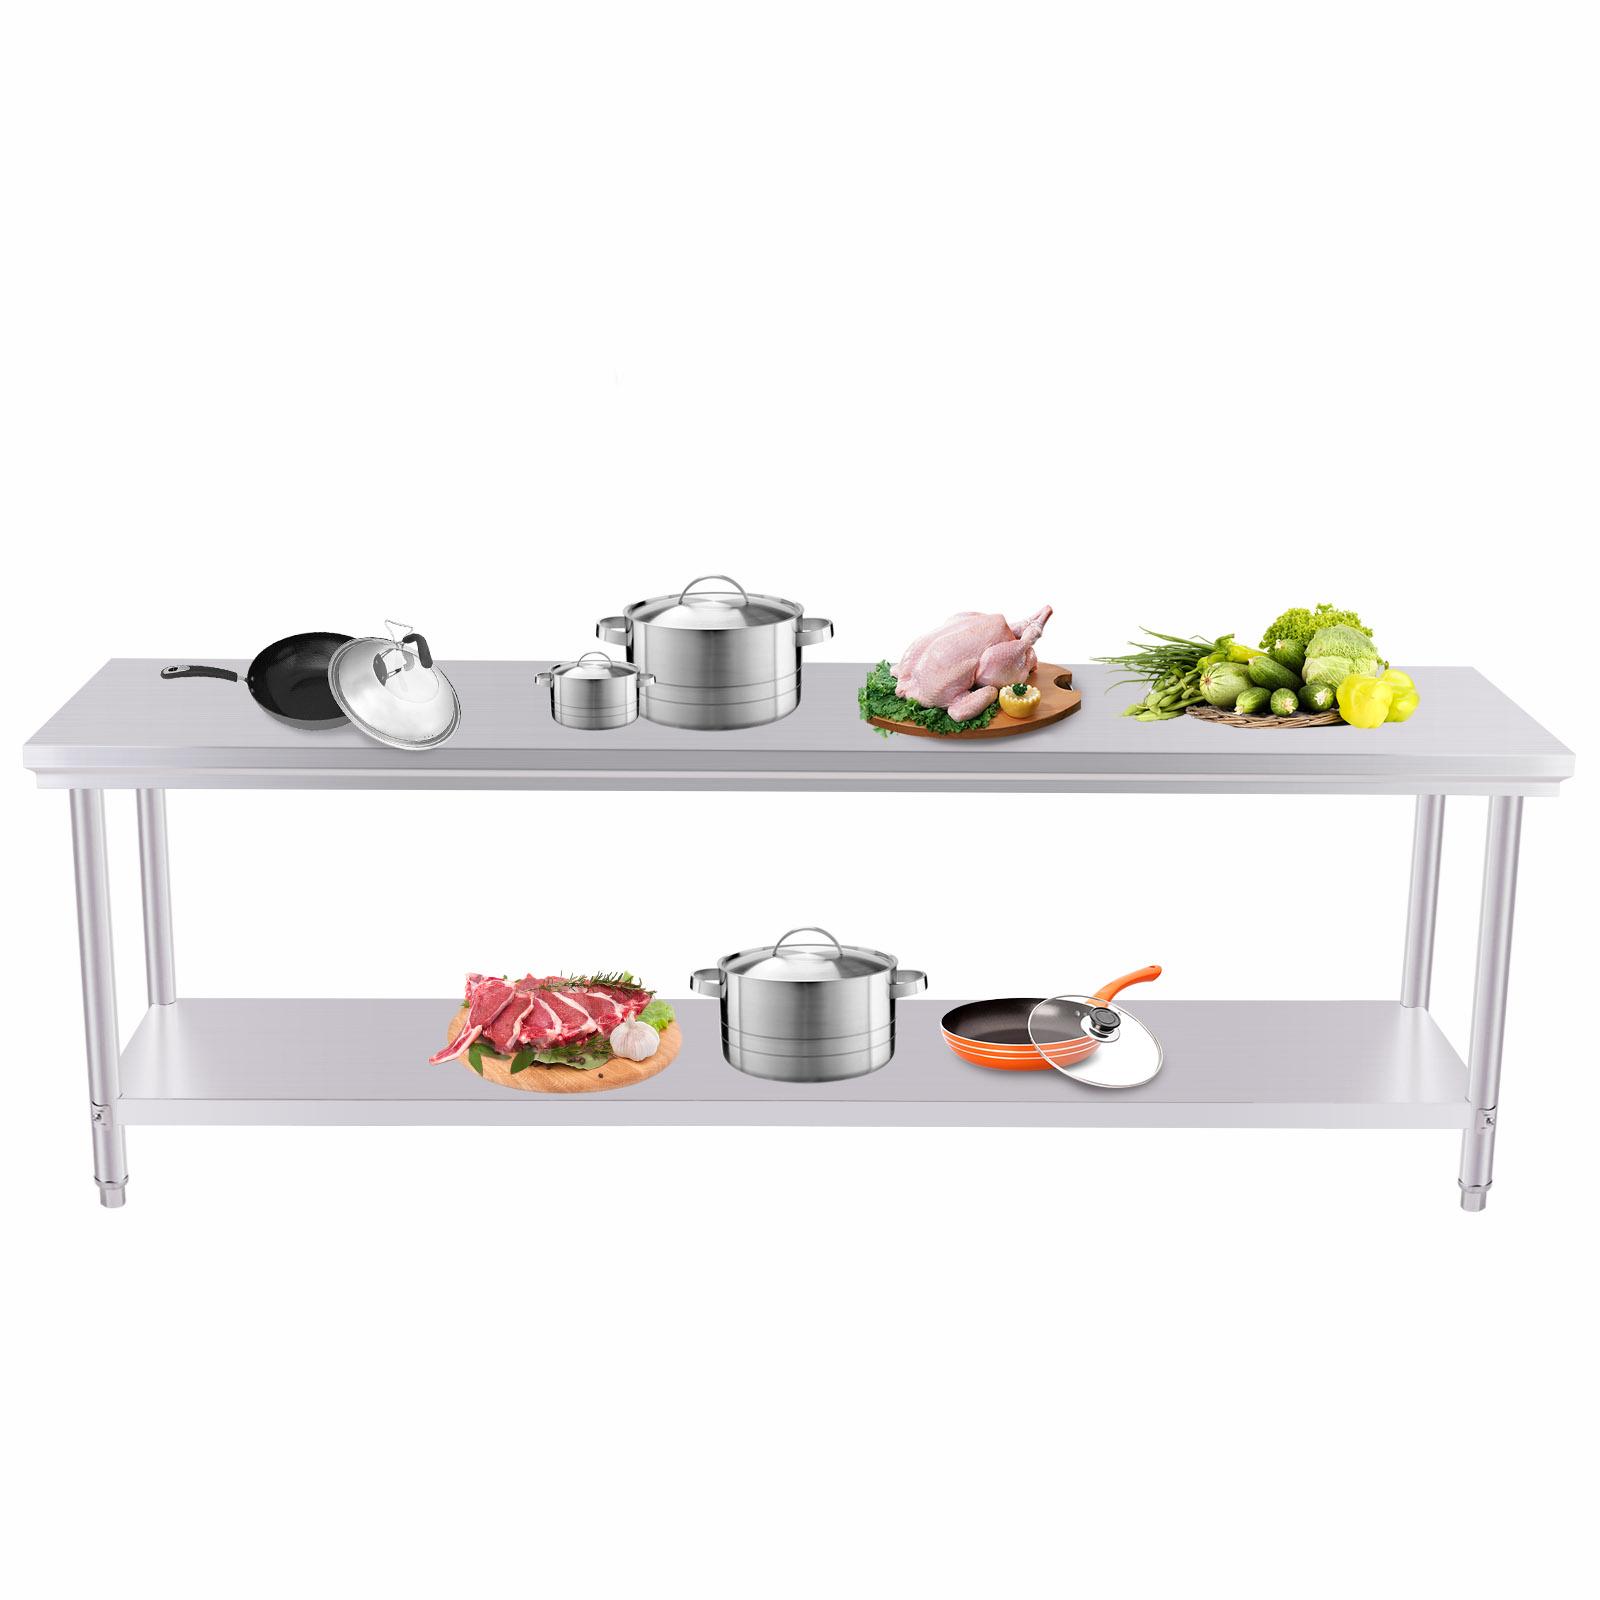 new stainless steel kitchen restaurant work bench food prep table